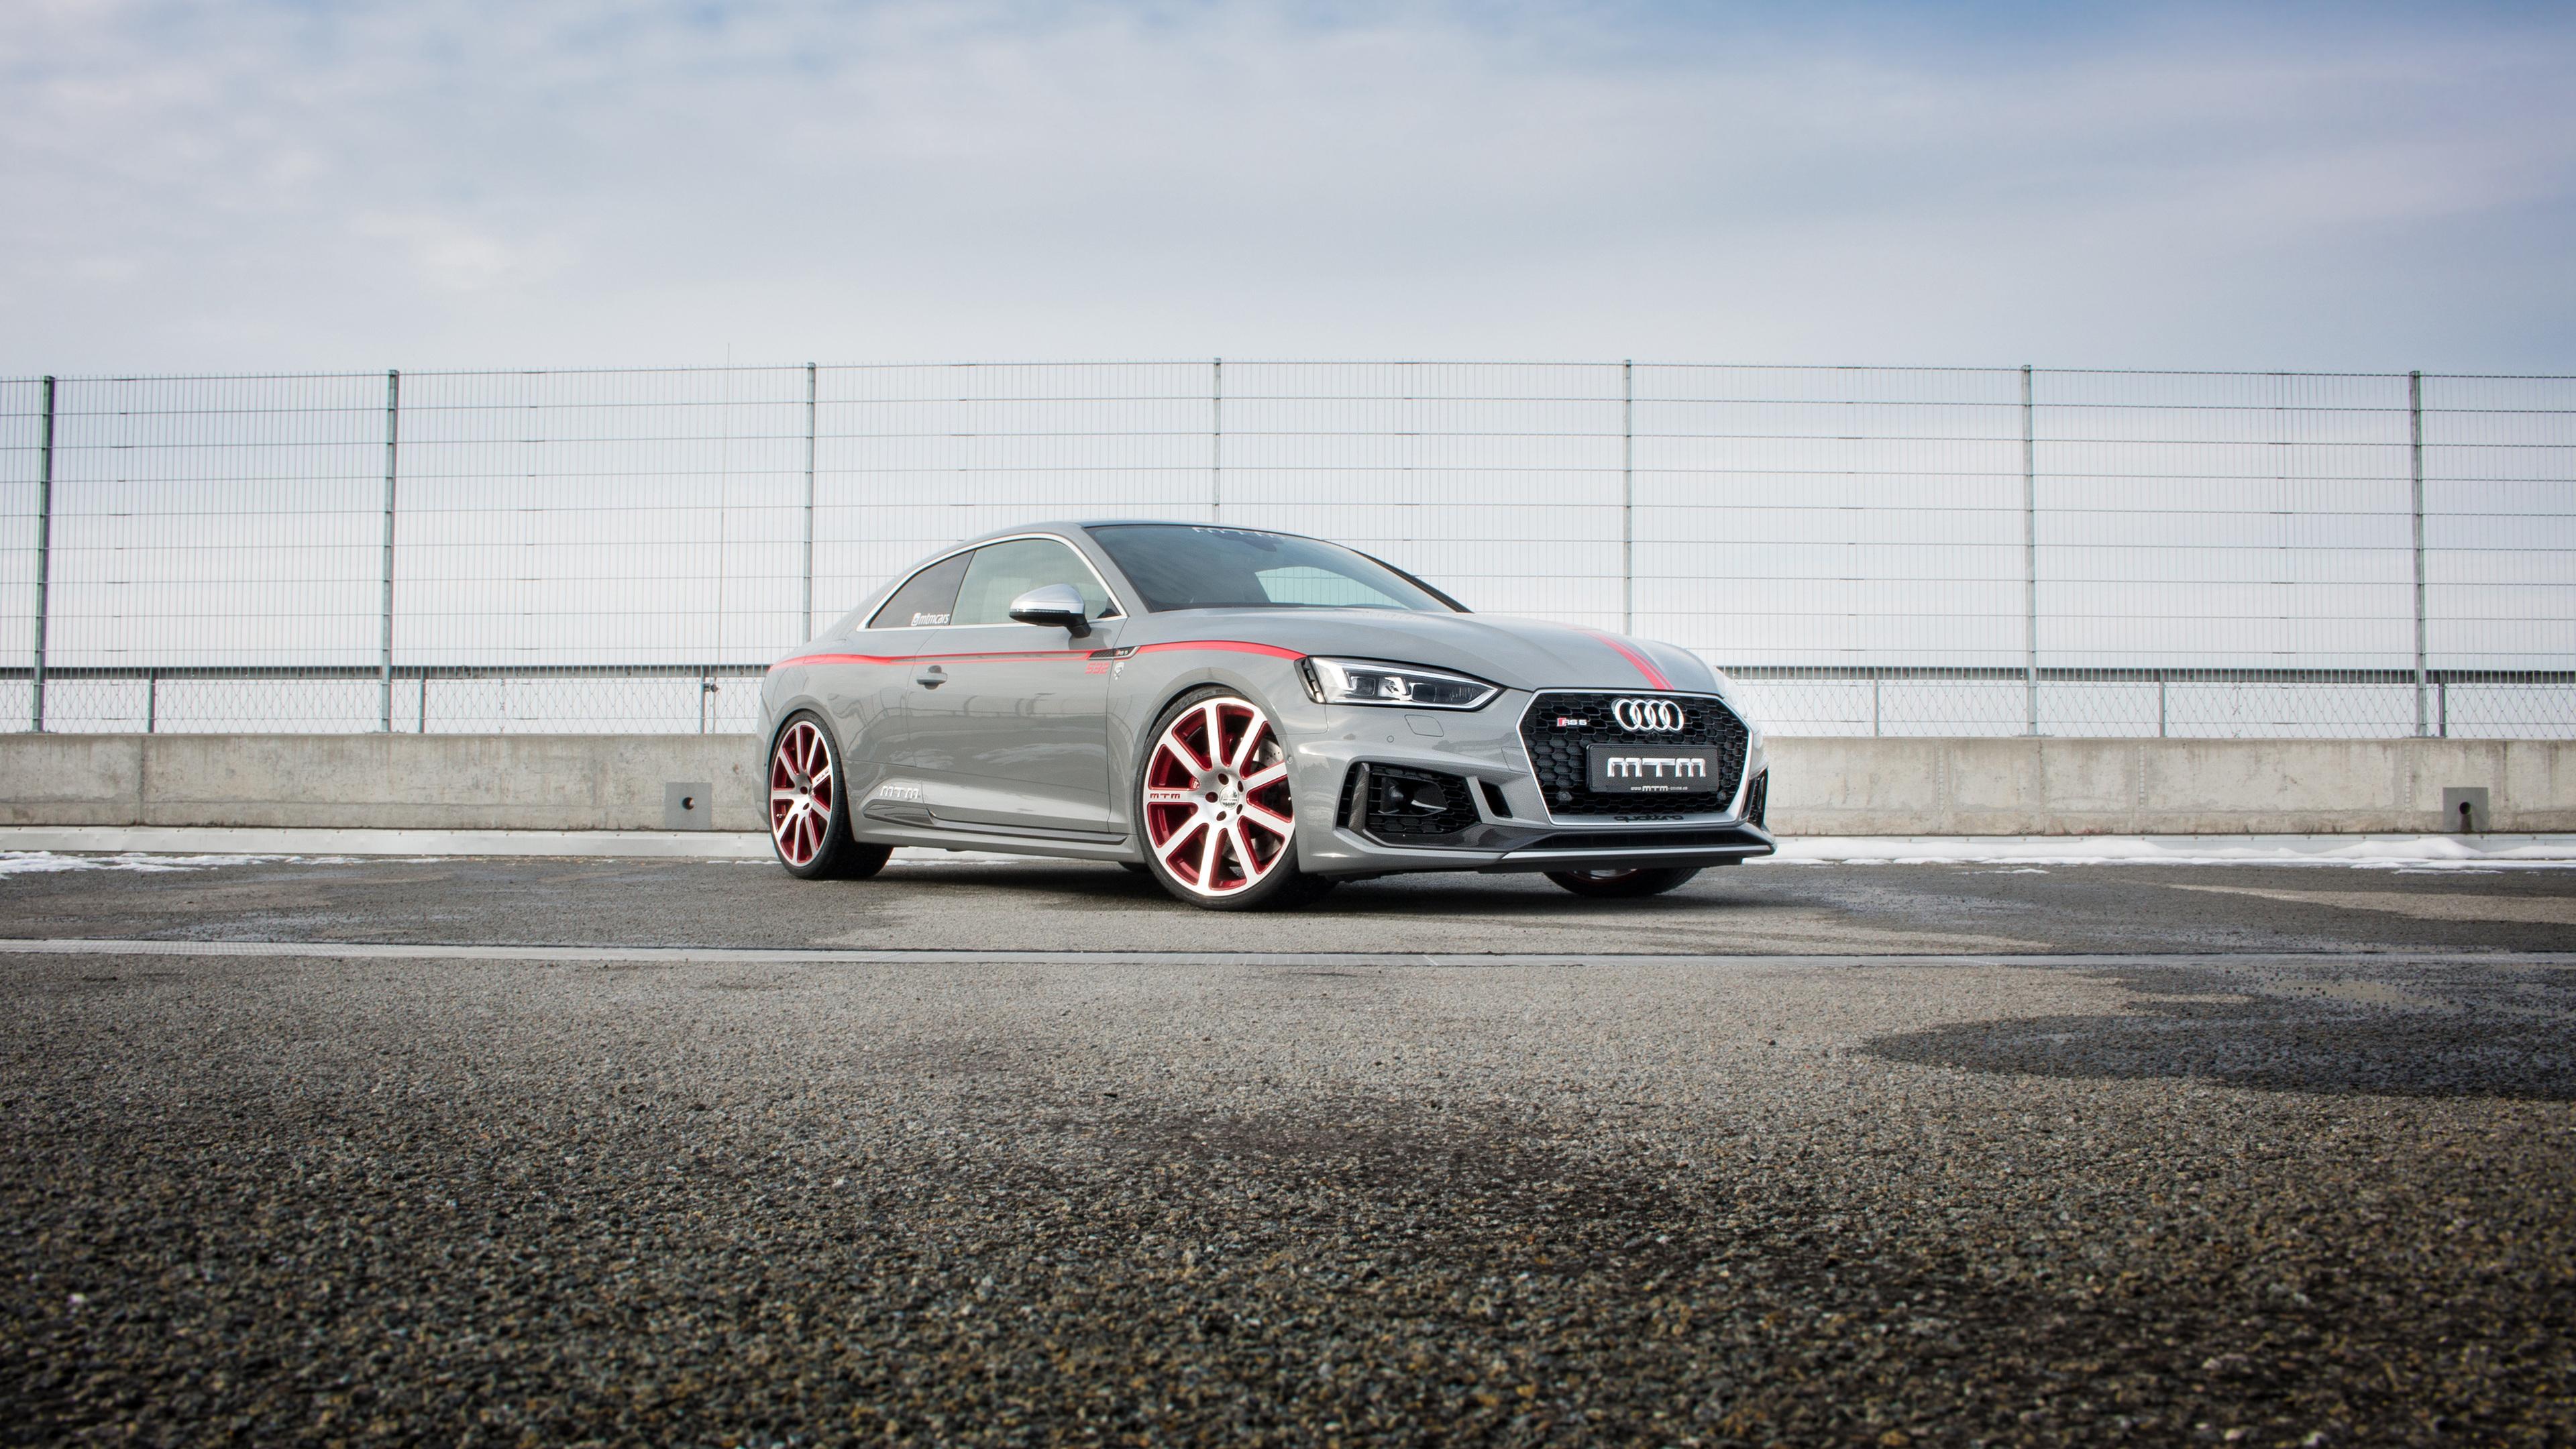 2018 mtm audi rs 5 r 1539110061 - 2018 MTM Audi RS 5 R - hd-wallpapers, cars wallpapers, audi wallpapers, audi rs5 wallpapers, 4k-wallpapers, 2018 cars wallpapers